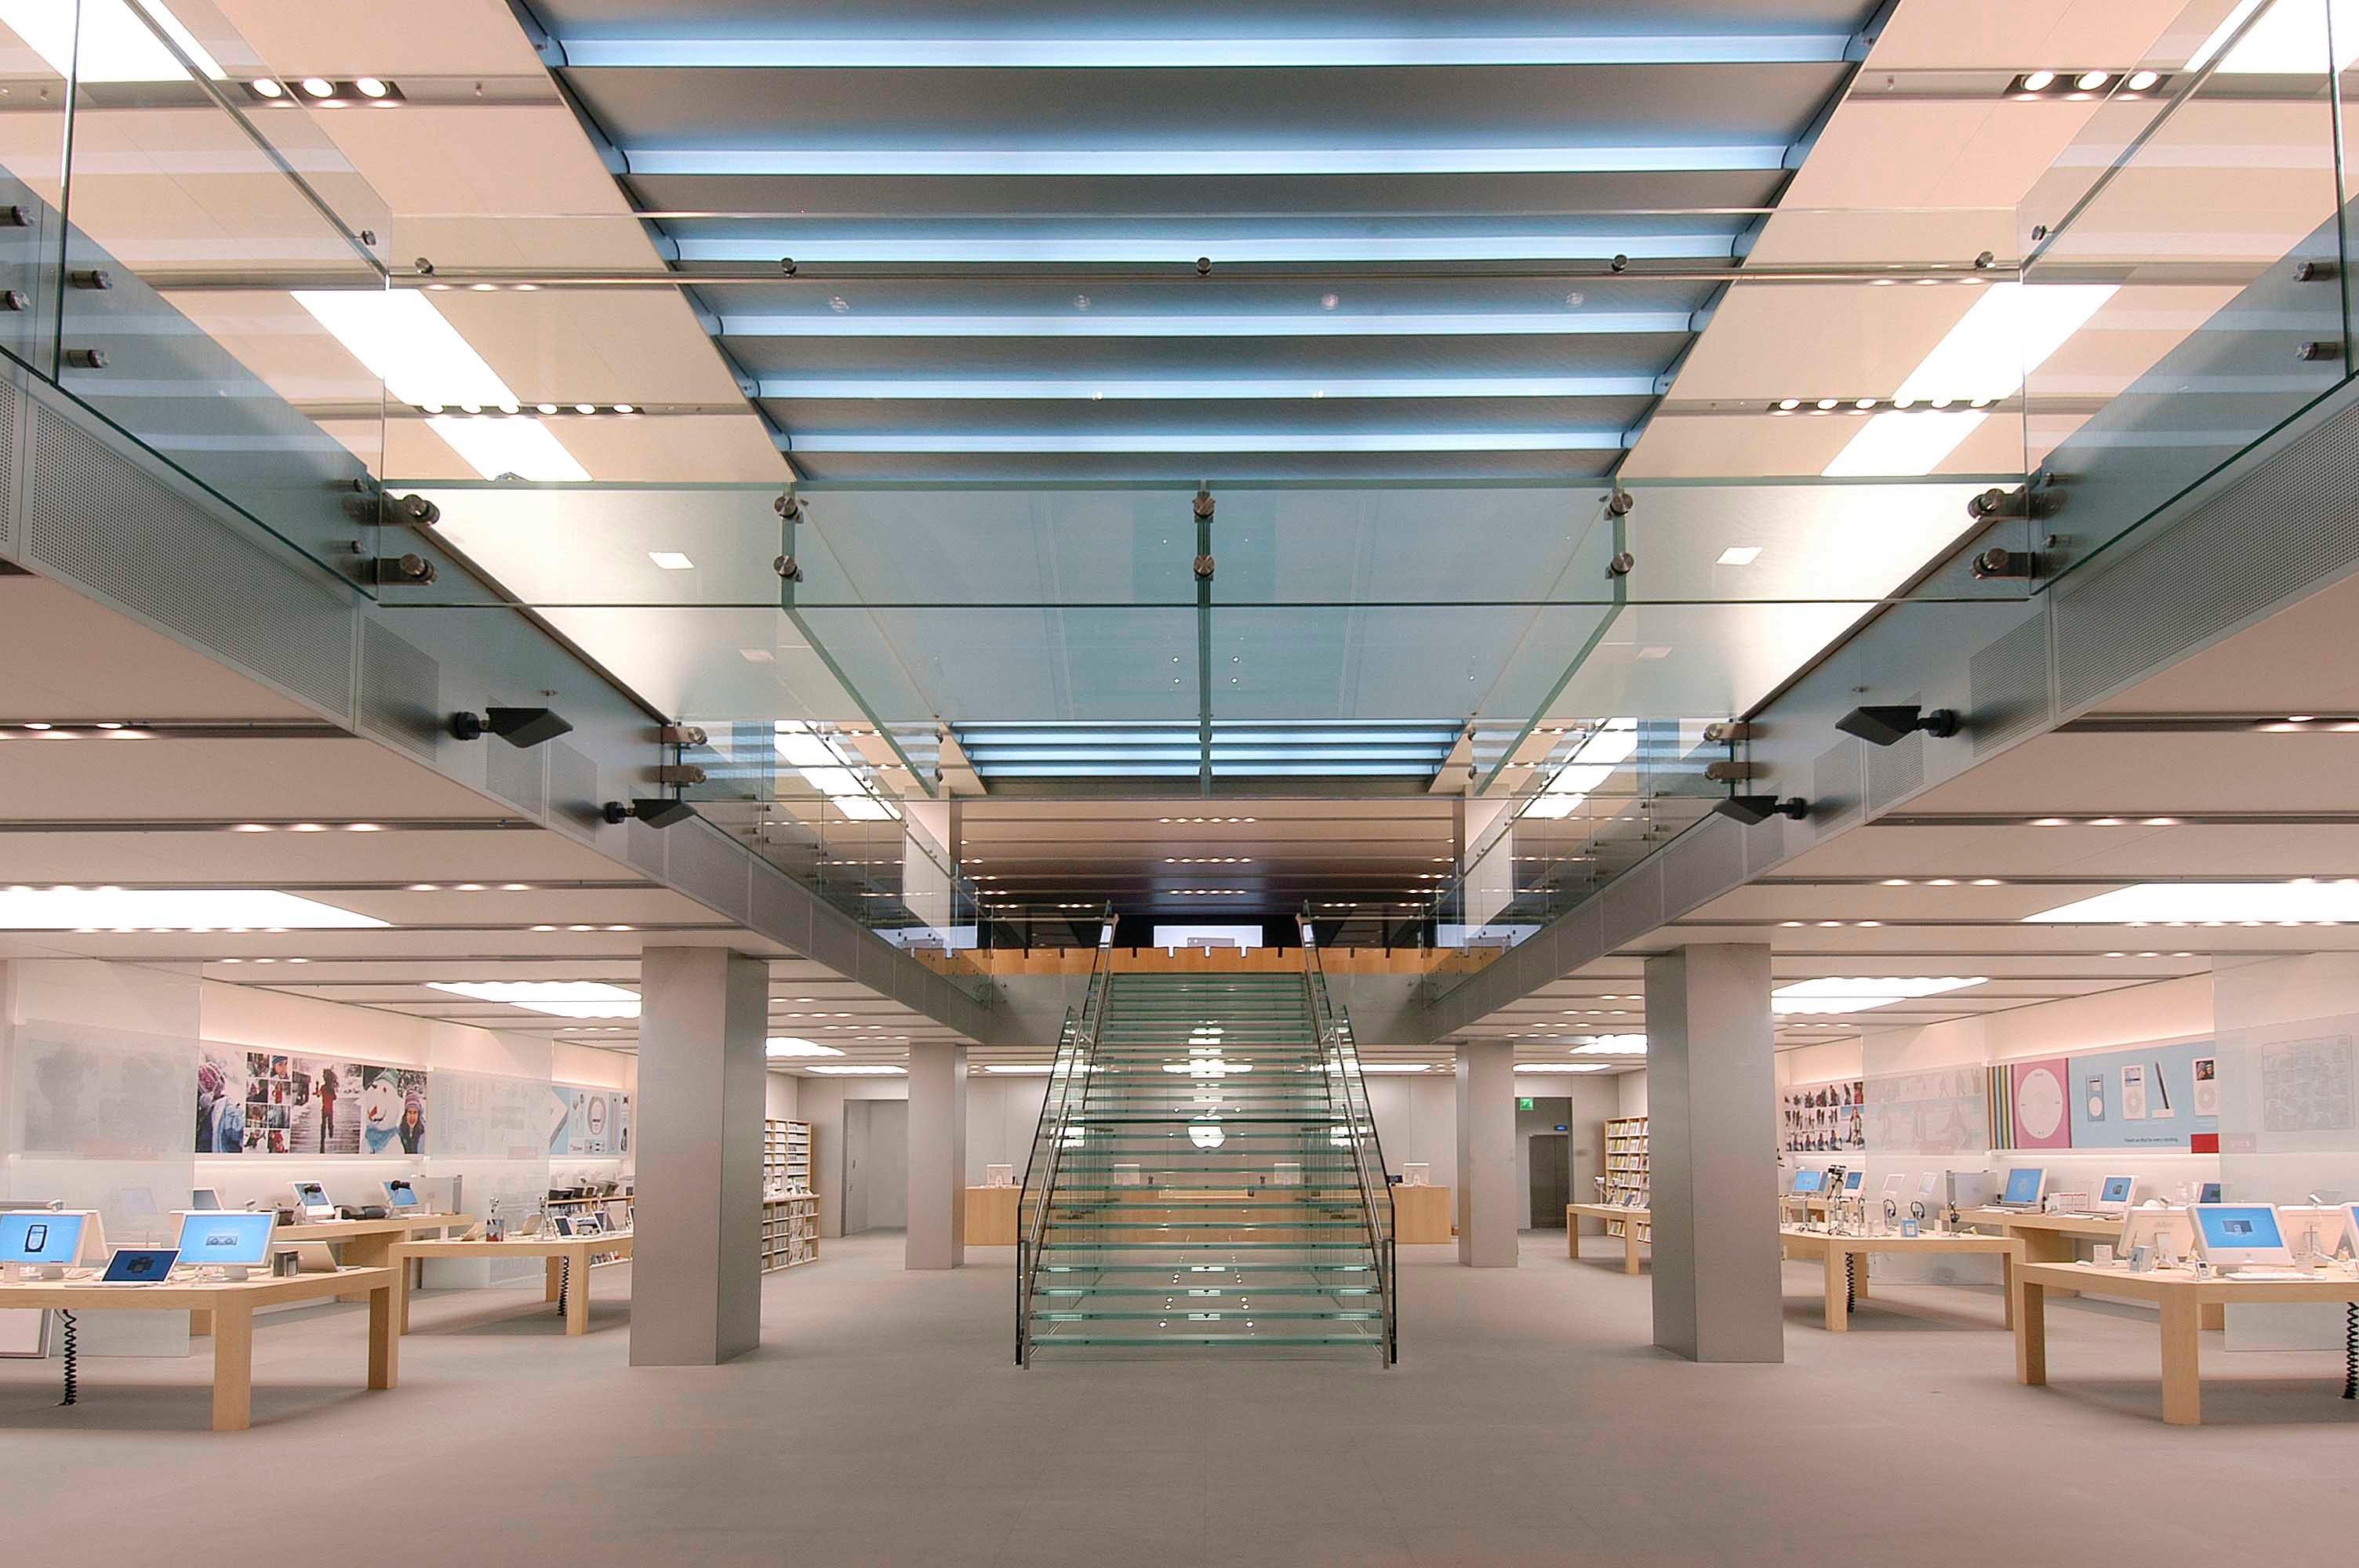 Apple Store Londen (oud)